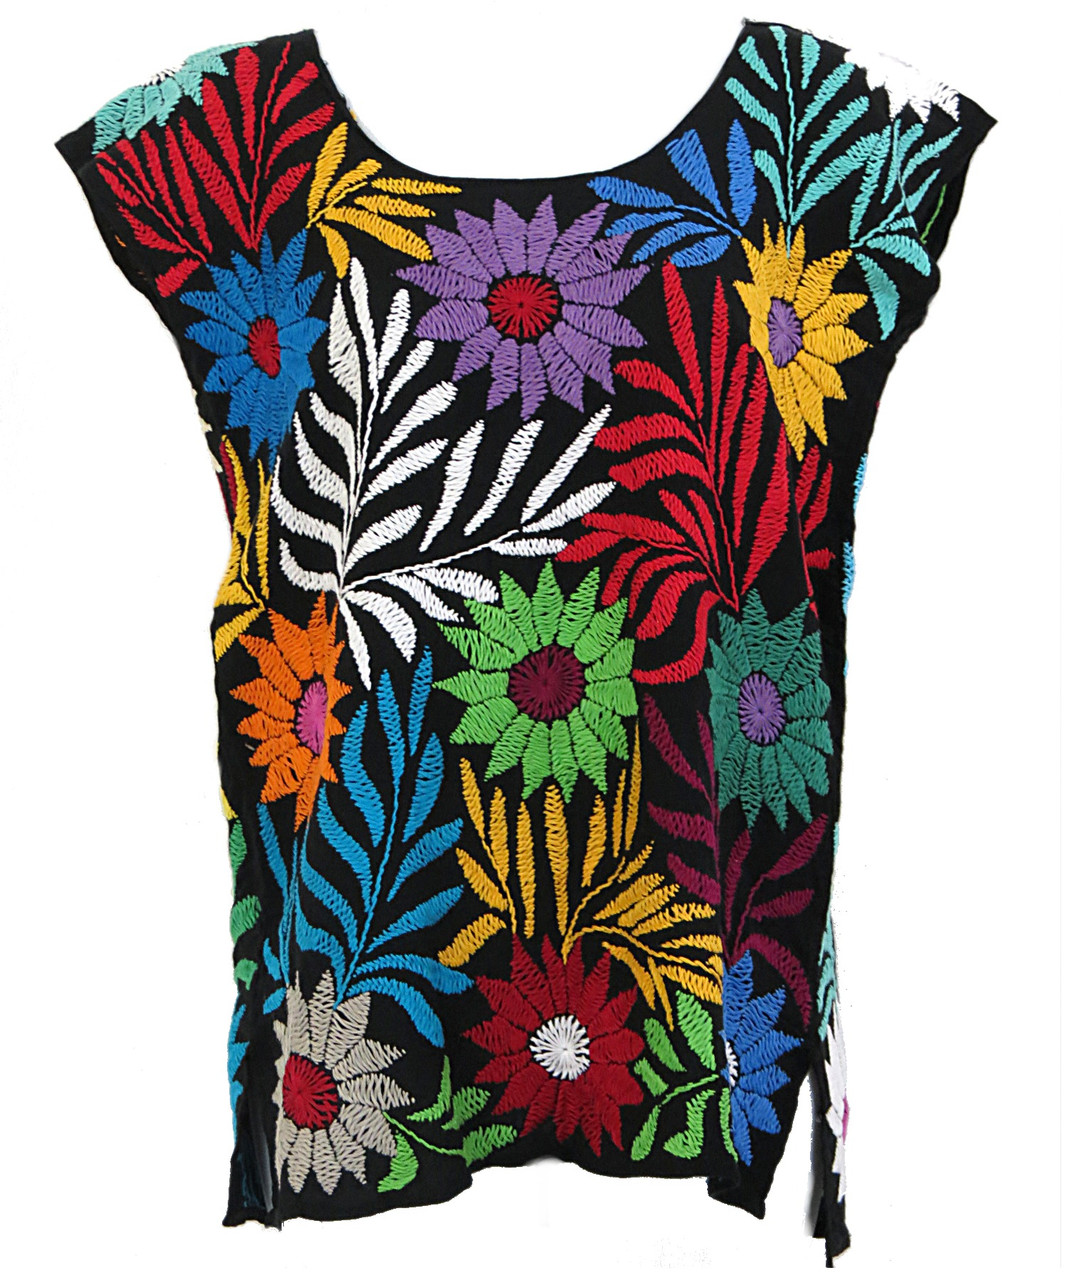 Oaxaca Mexican Embroidery San Antonio Blouse small medium